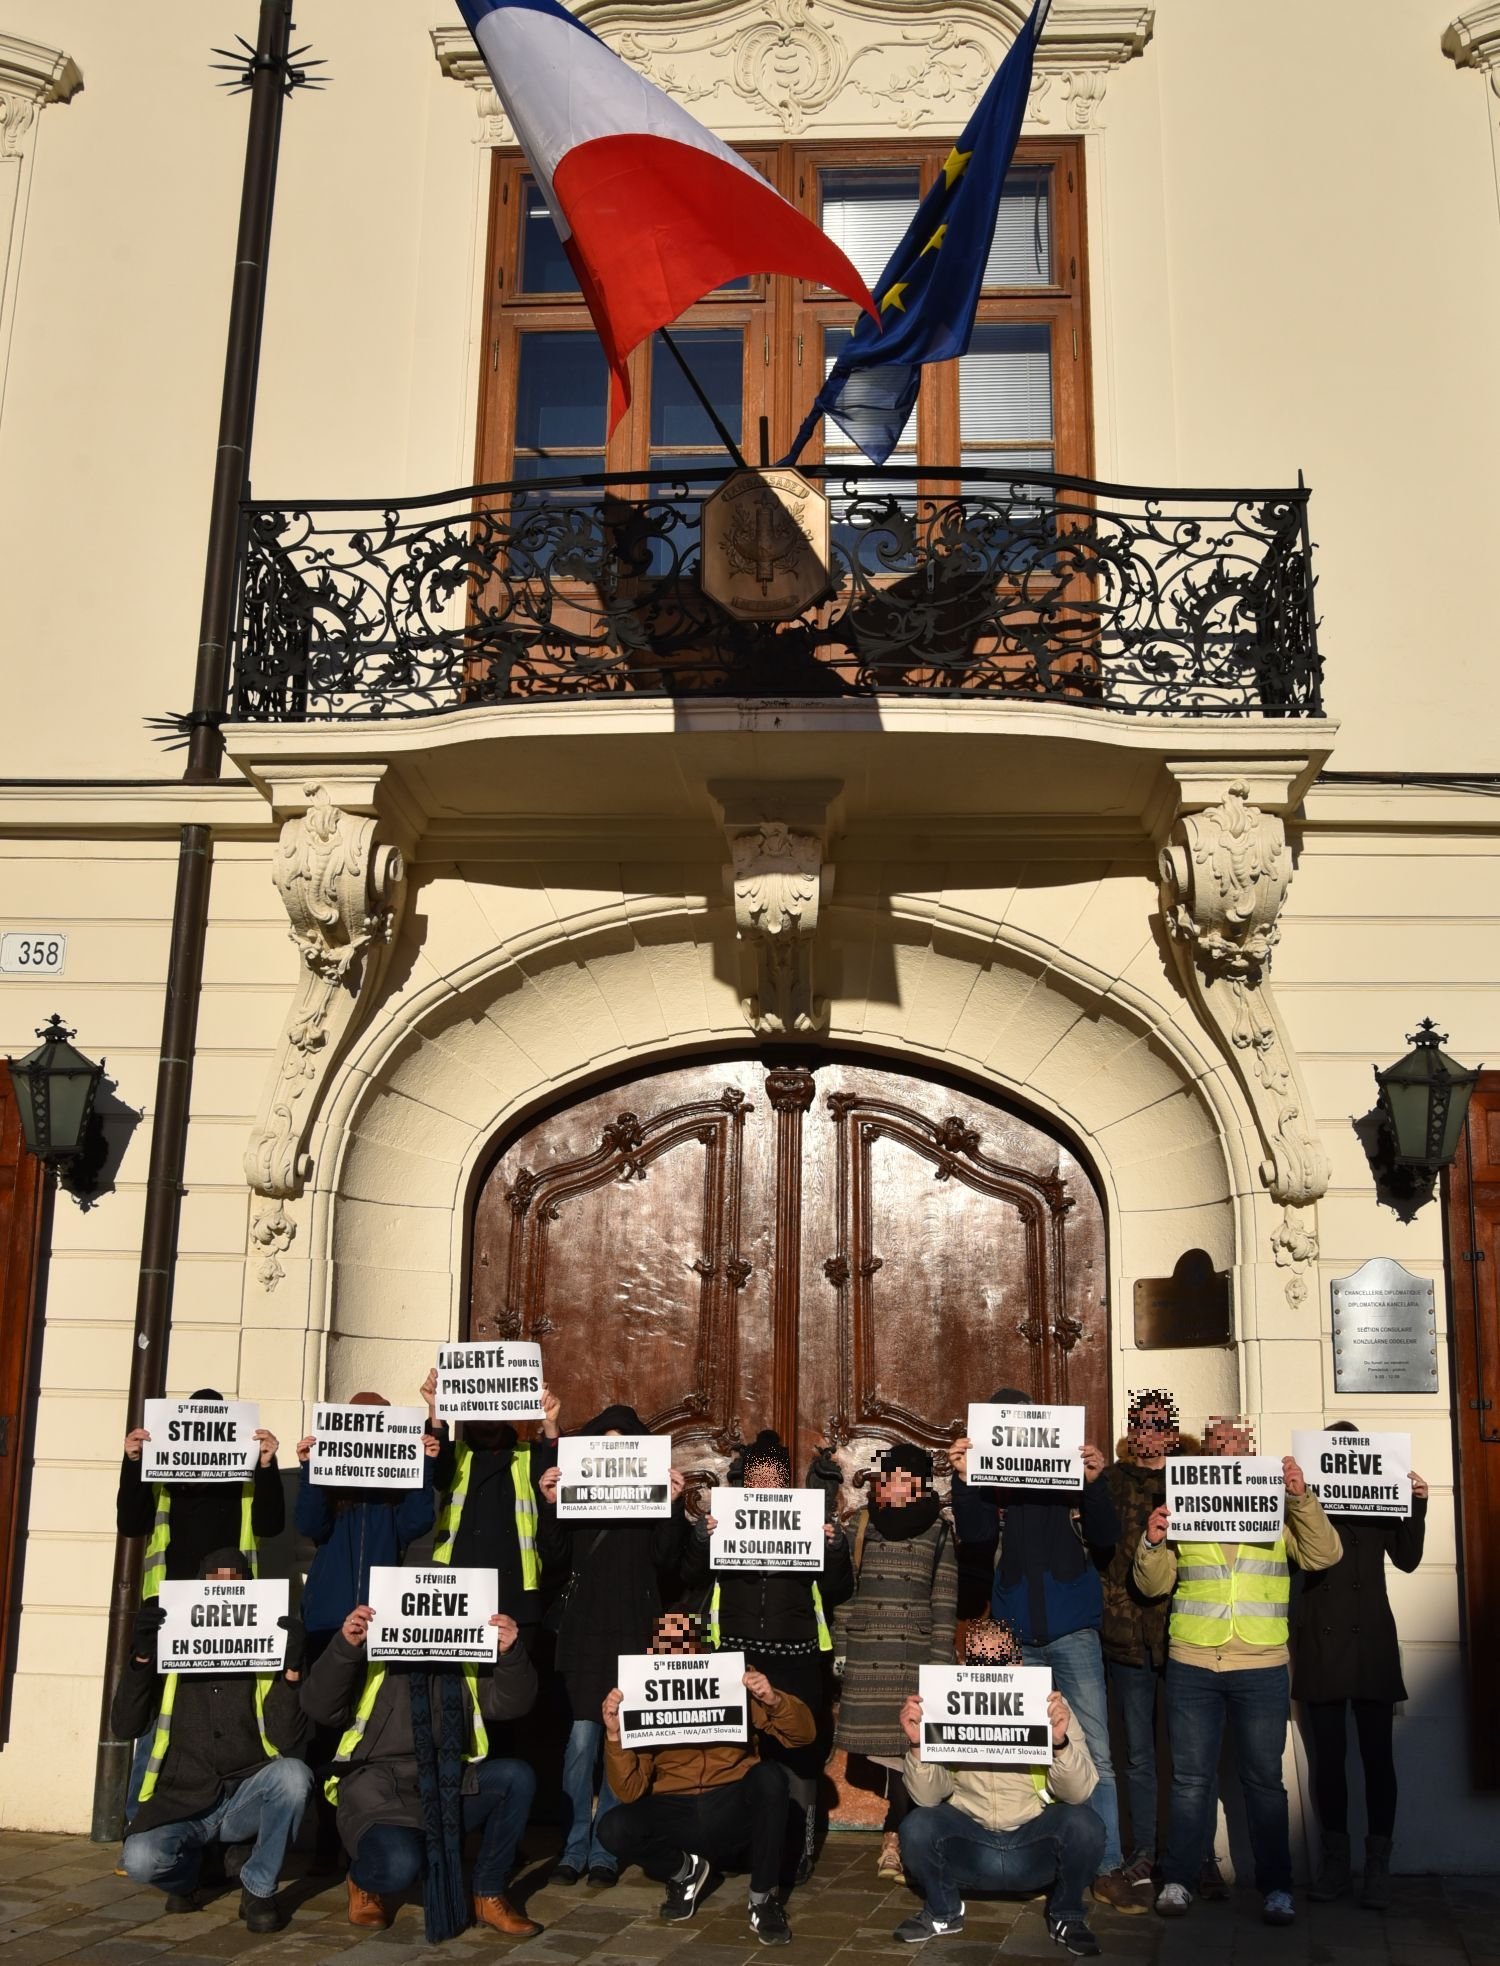 PA_Bratislava_Protest_Vests_2